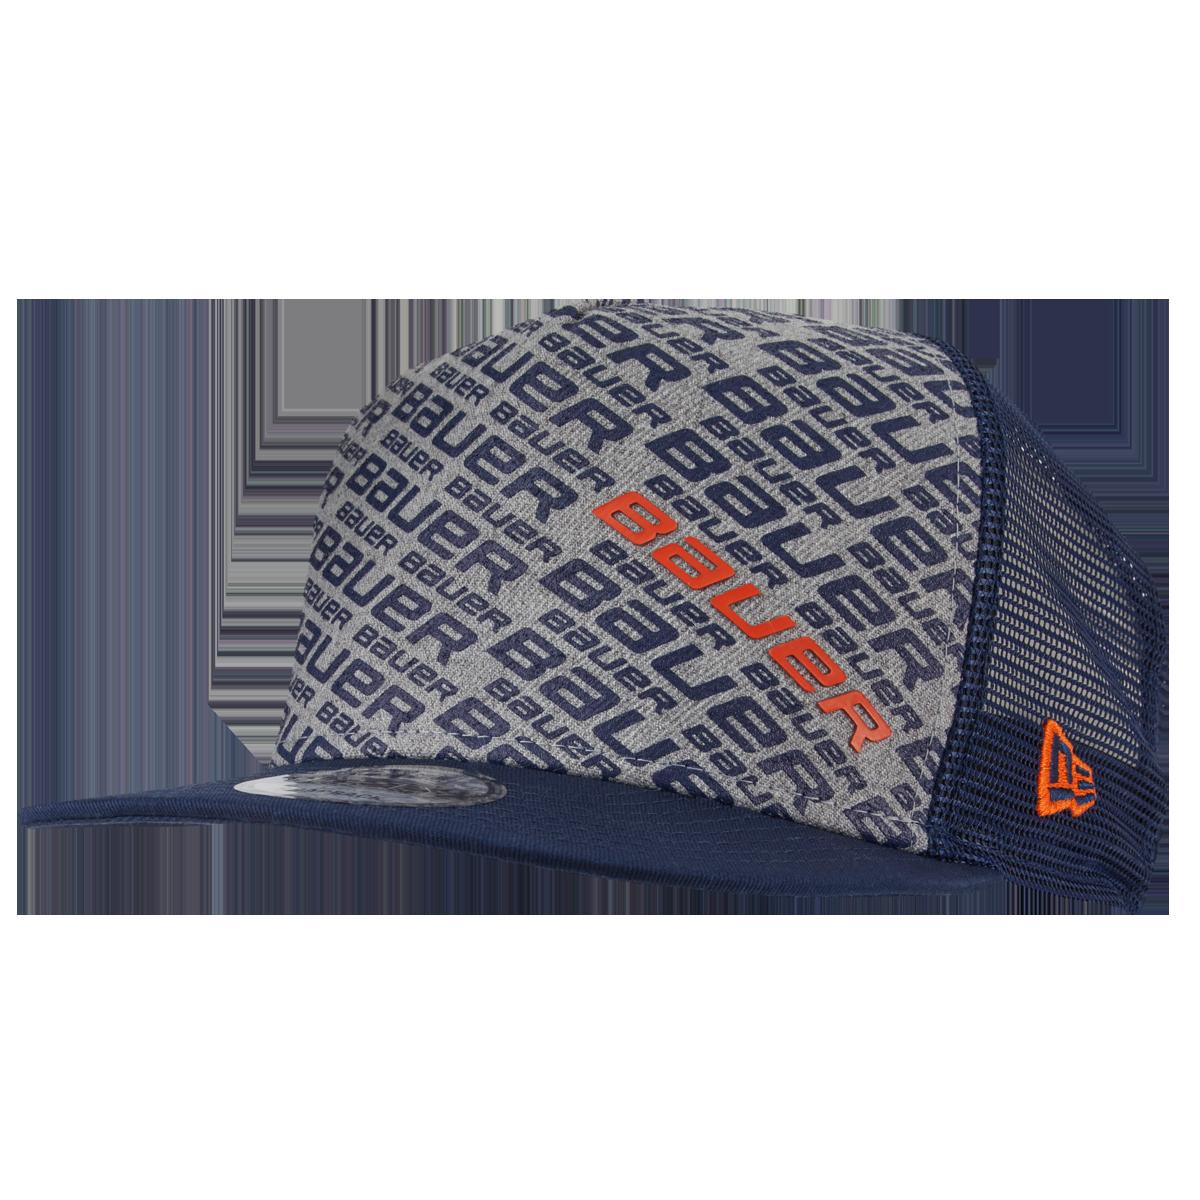 New Era 9FIFTY Snapback Repeat Hat